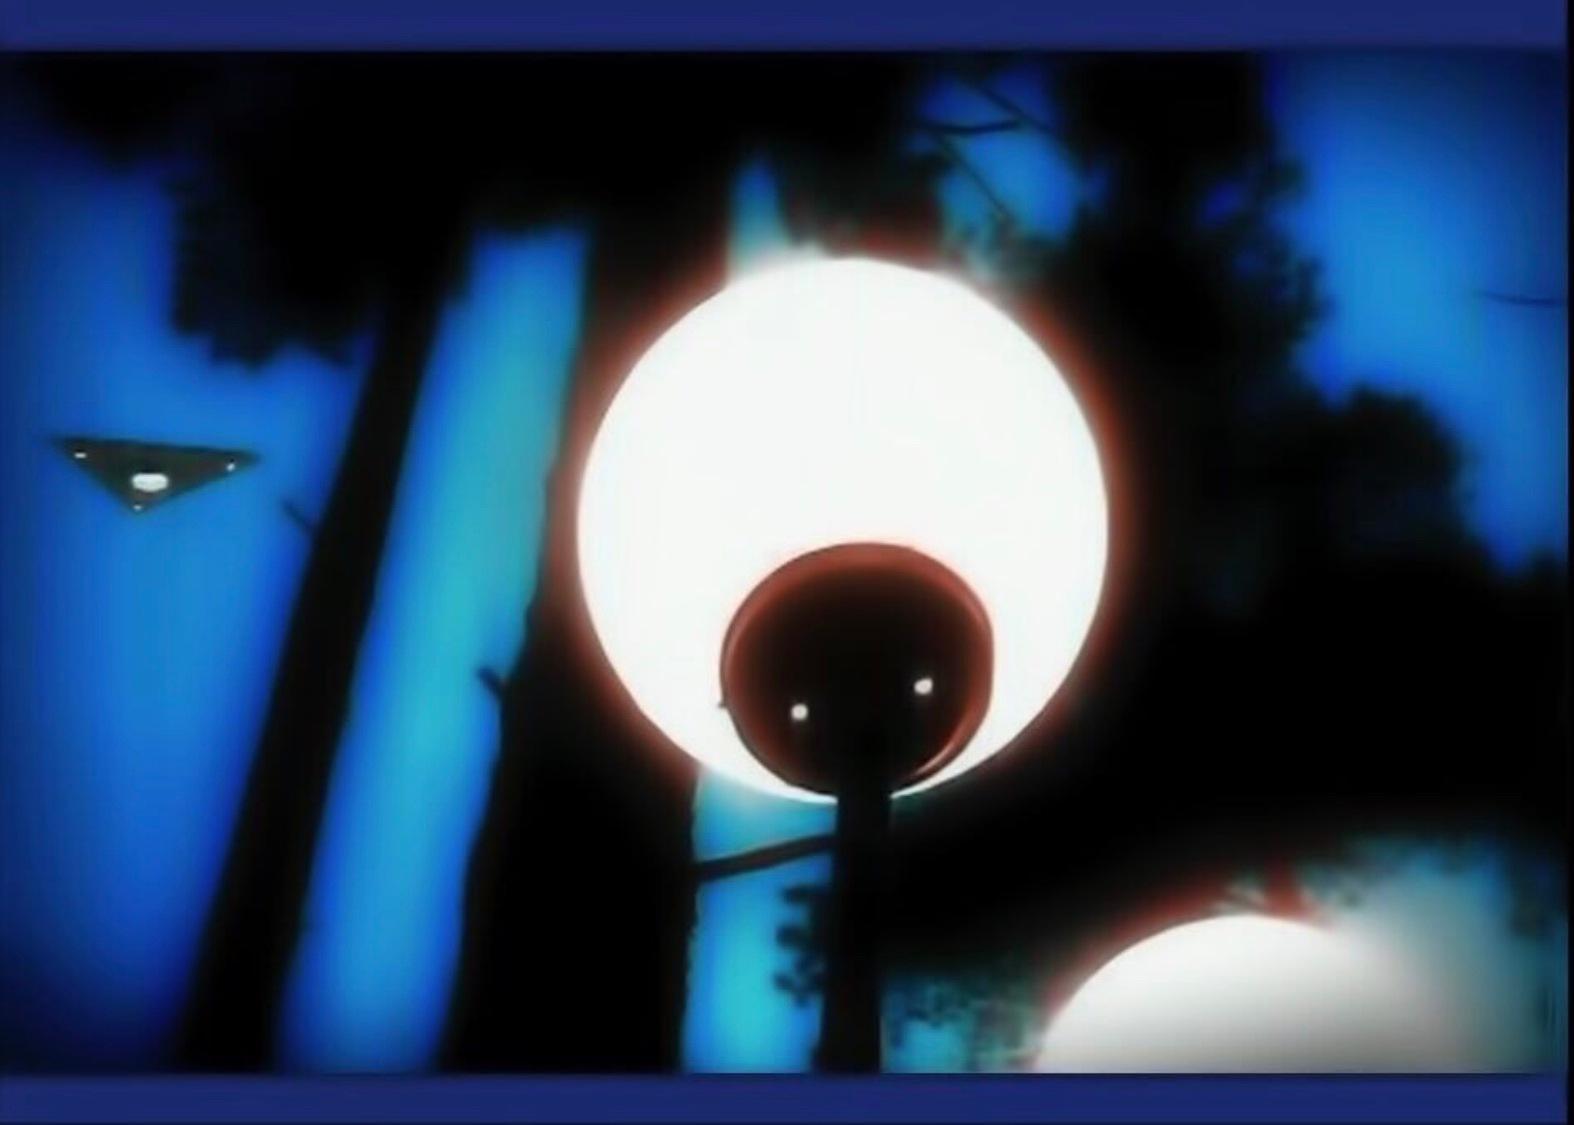 Night Shift by iensueno